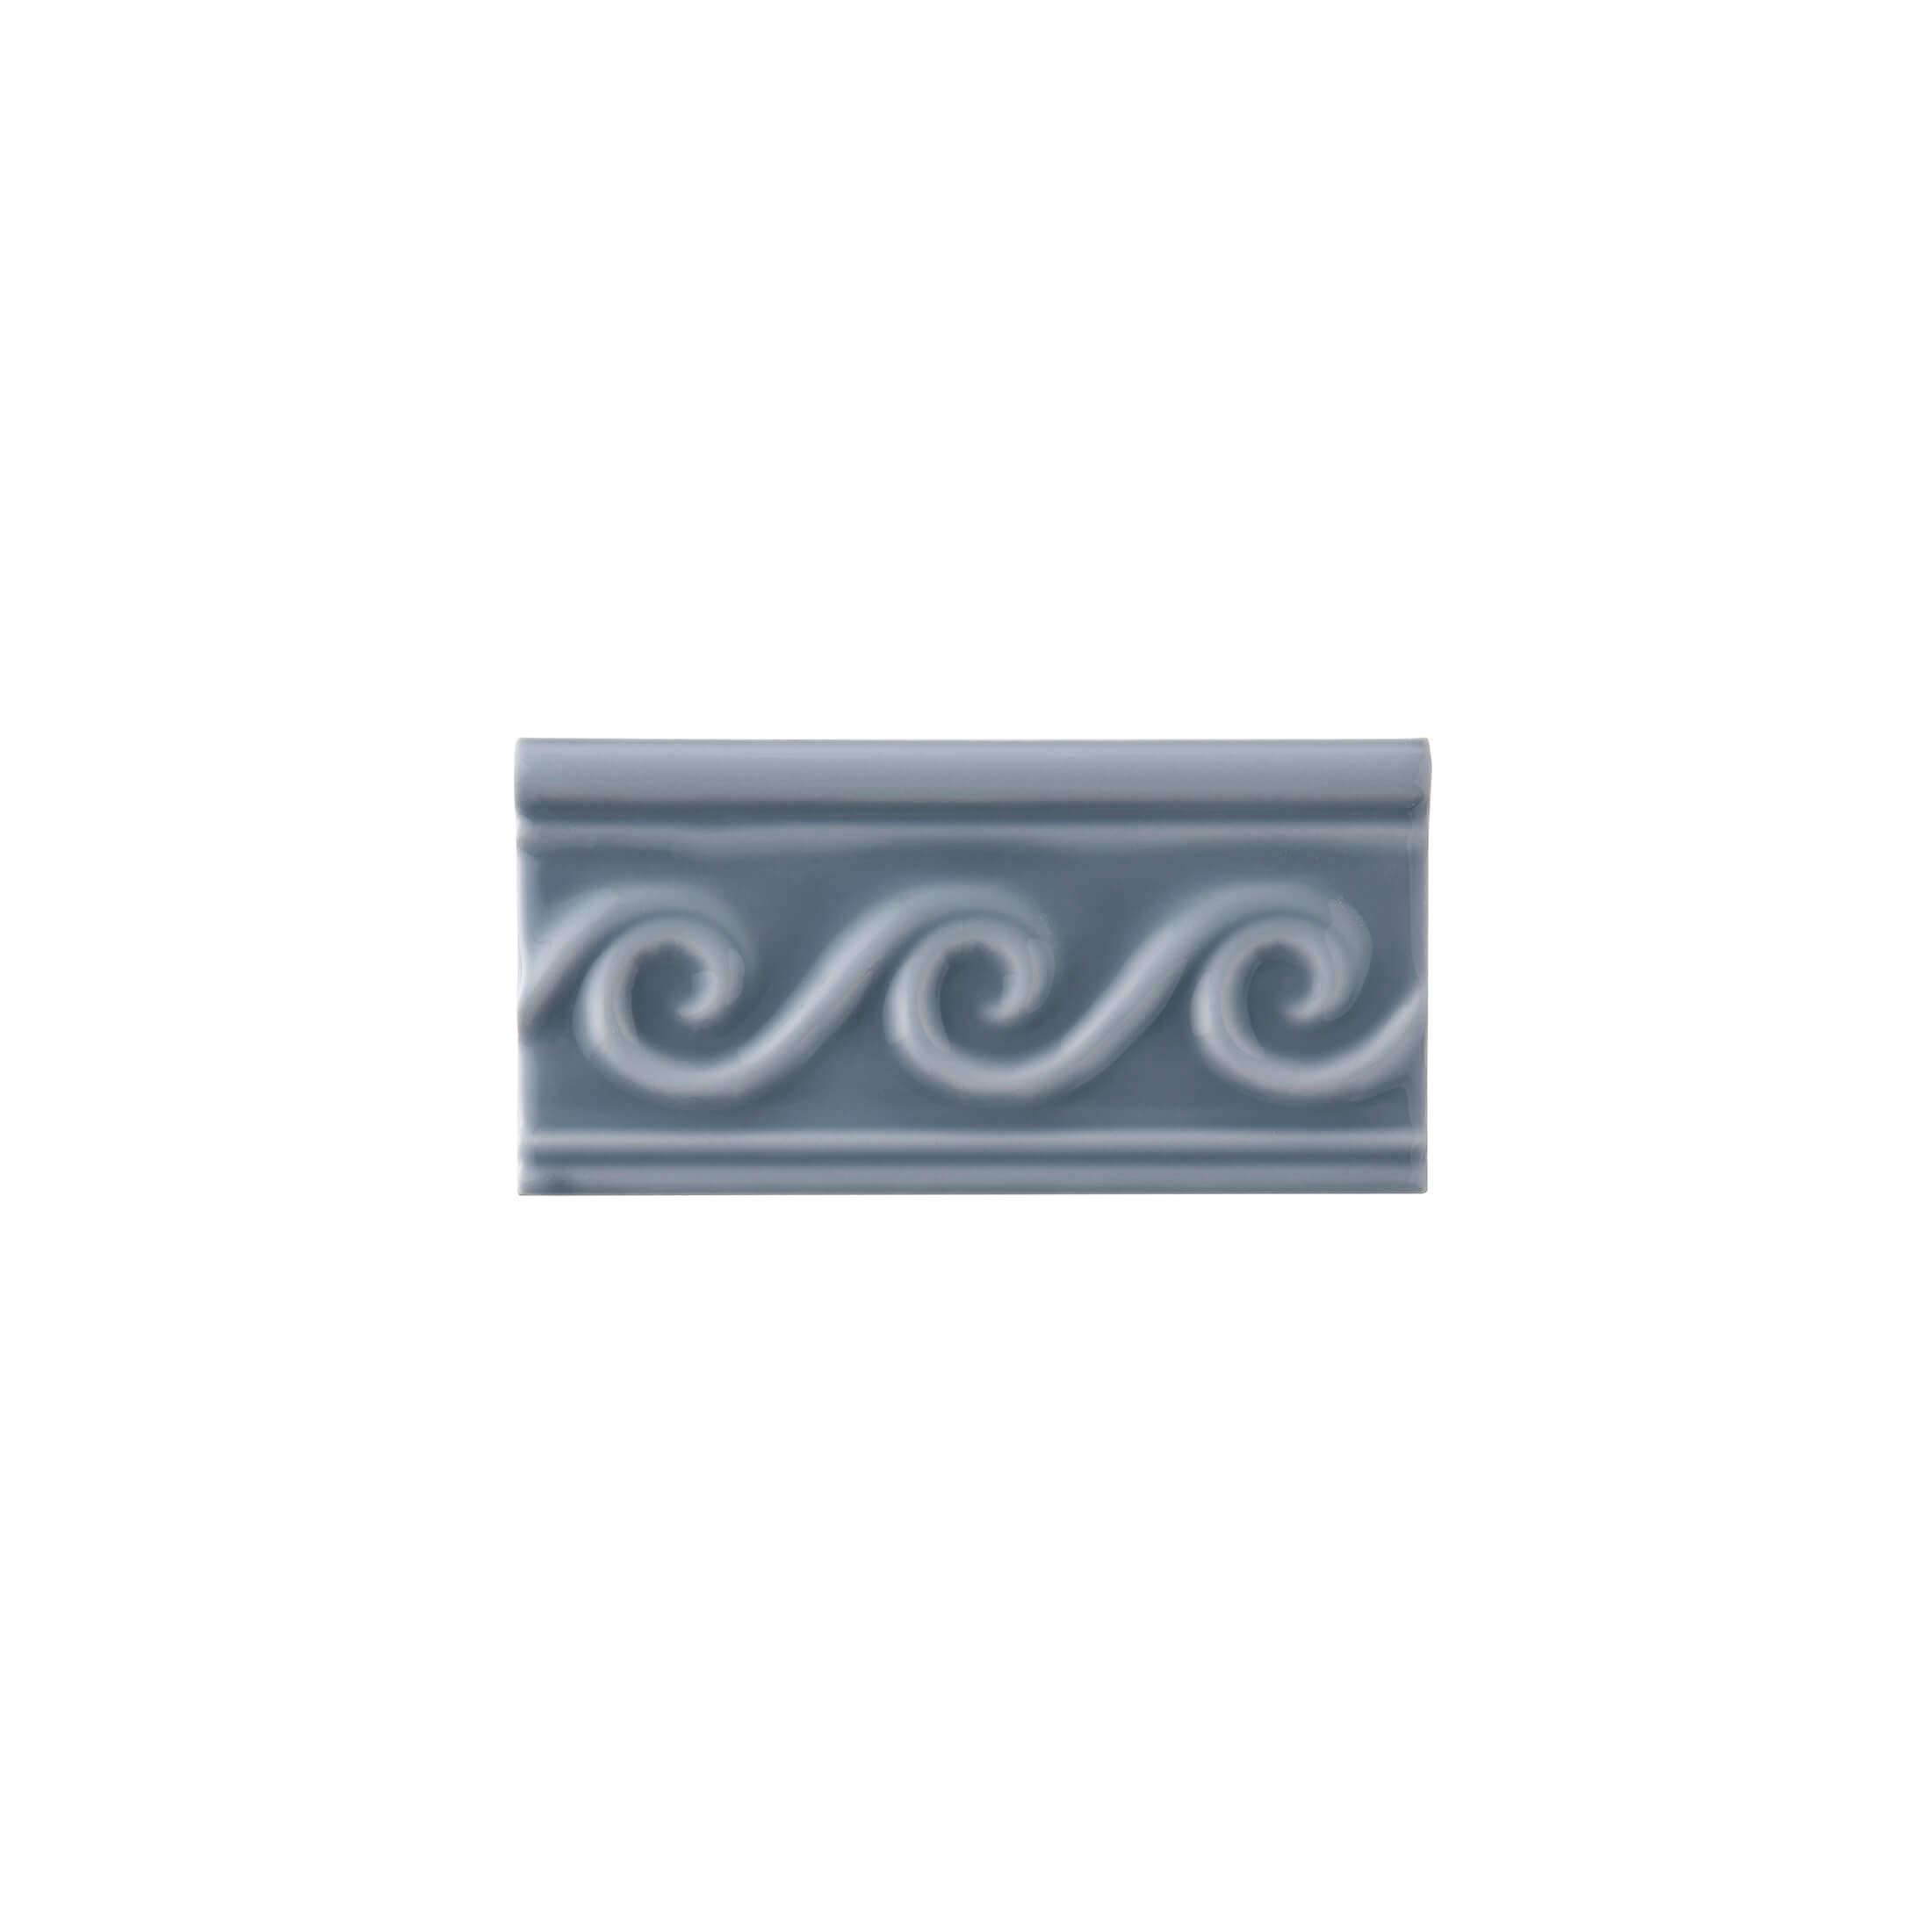 ADNE4141 - RELIEVE OLAS PB - 7.5 cm X 15 cm